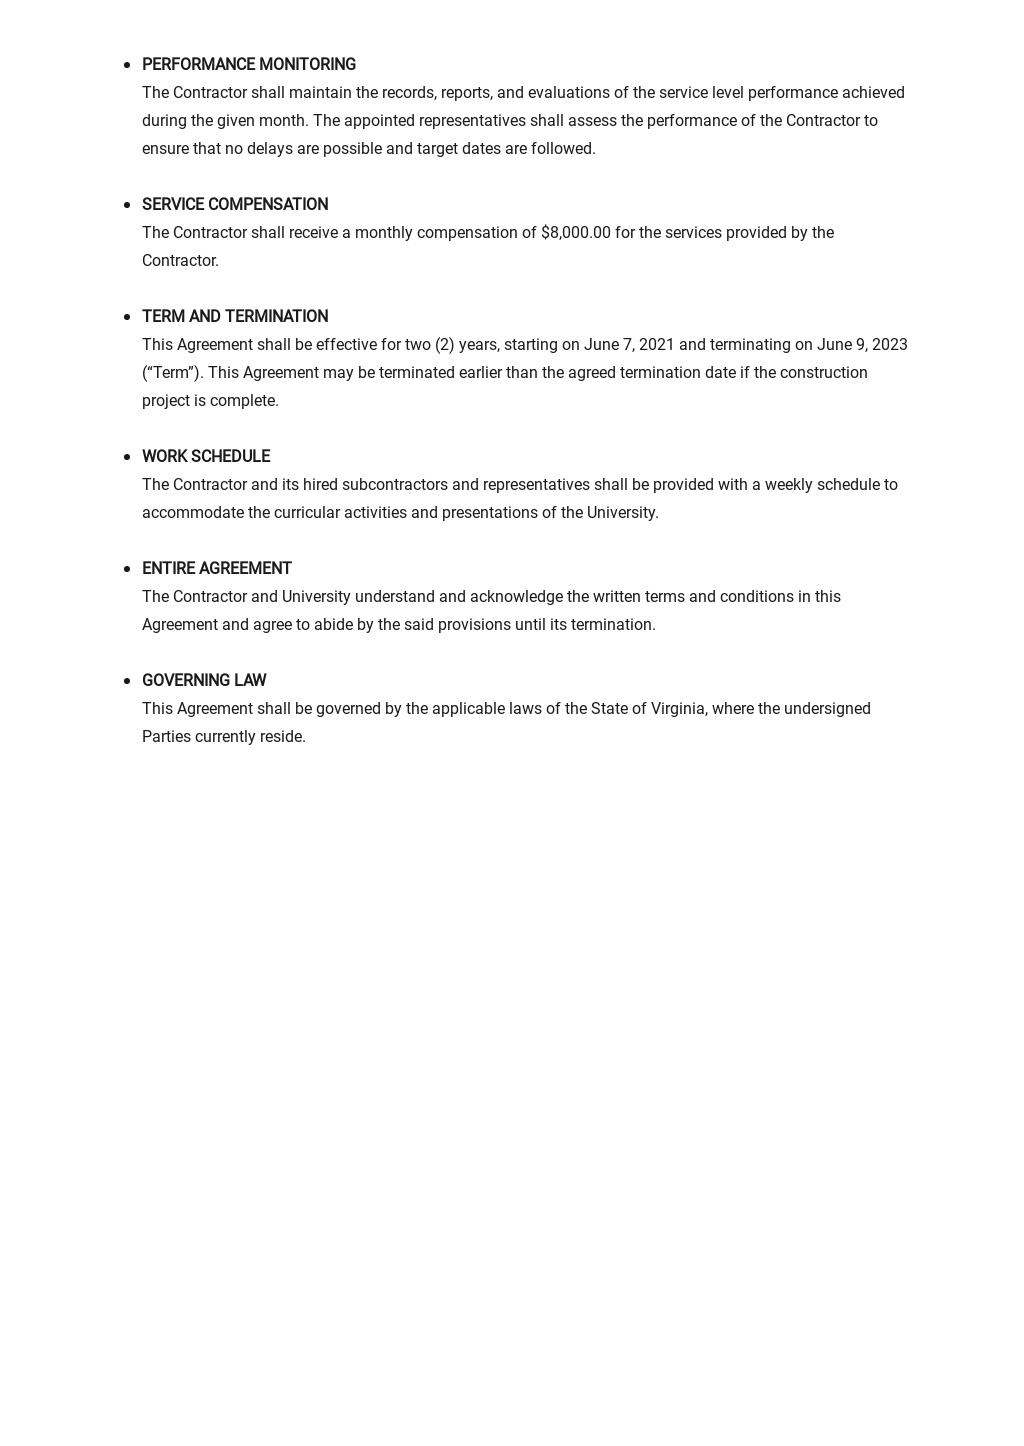 University Service Level Agreement Template 2.jpe